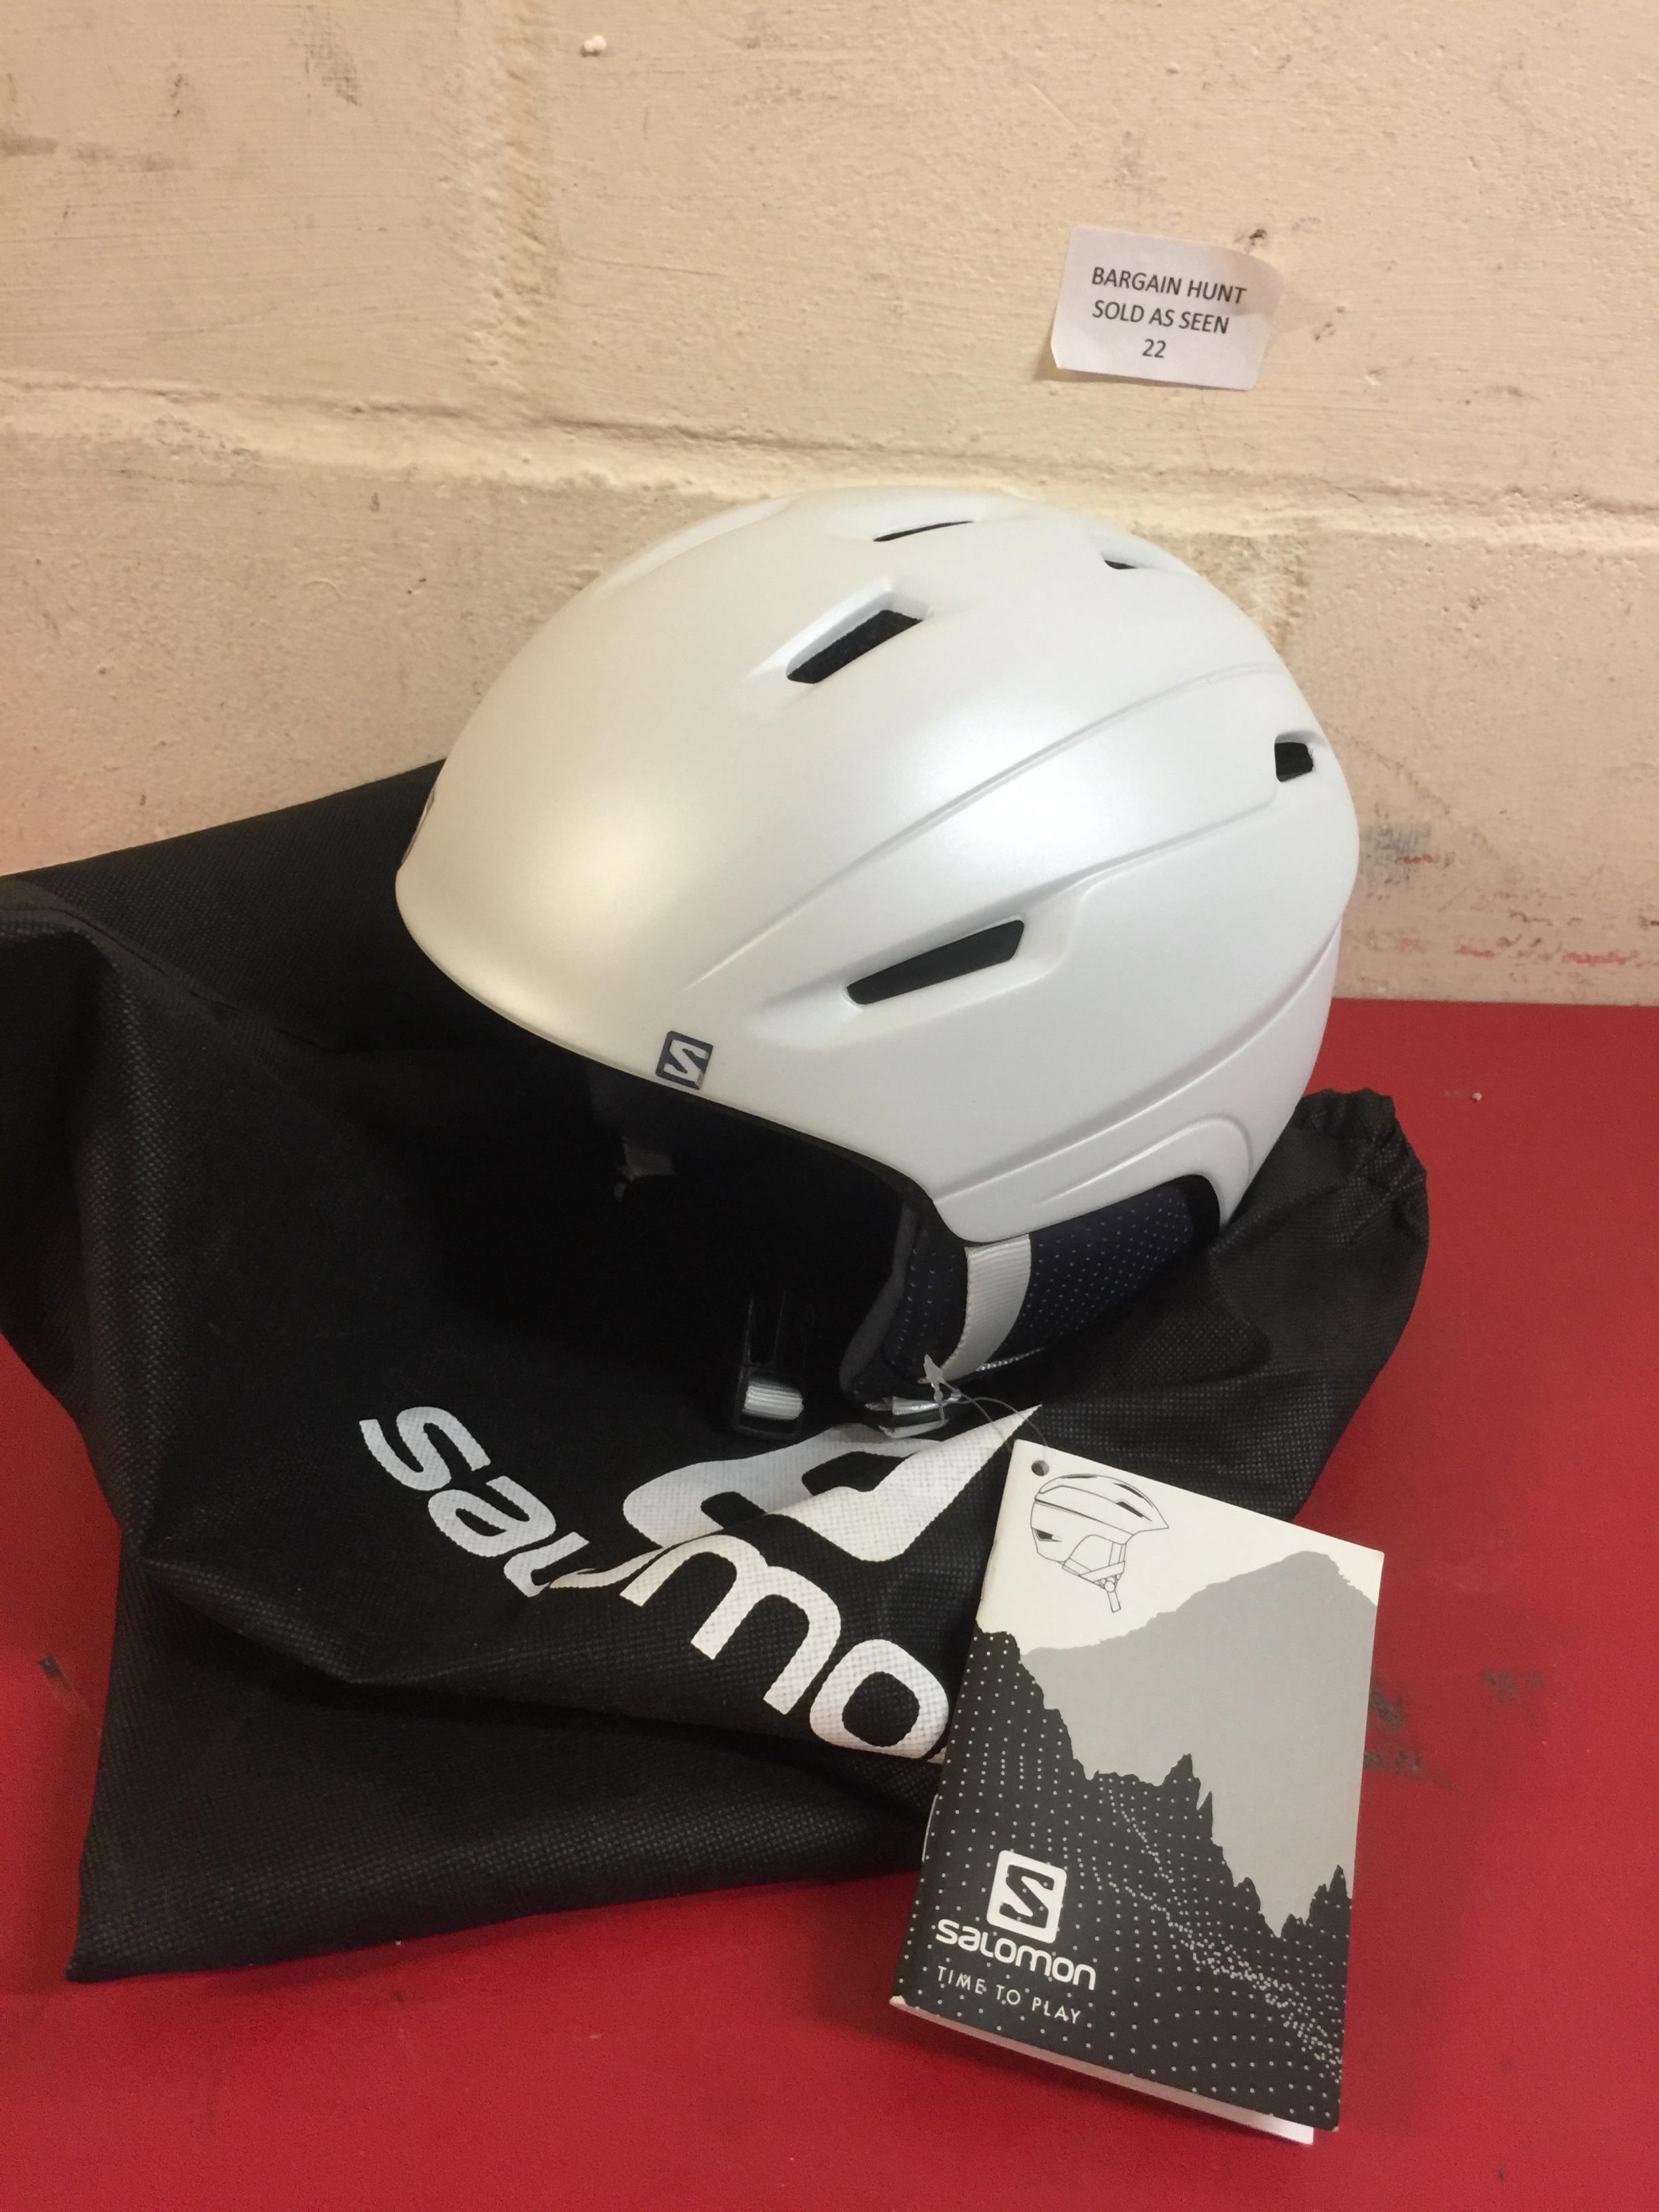 Lot 22 - Salomon, Women's Helmet, All Mountain Ski and Snowboard RRP £79.99